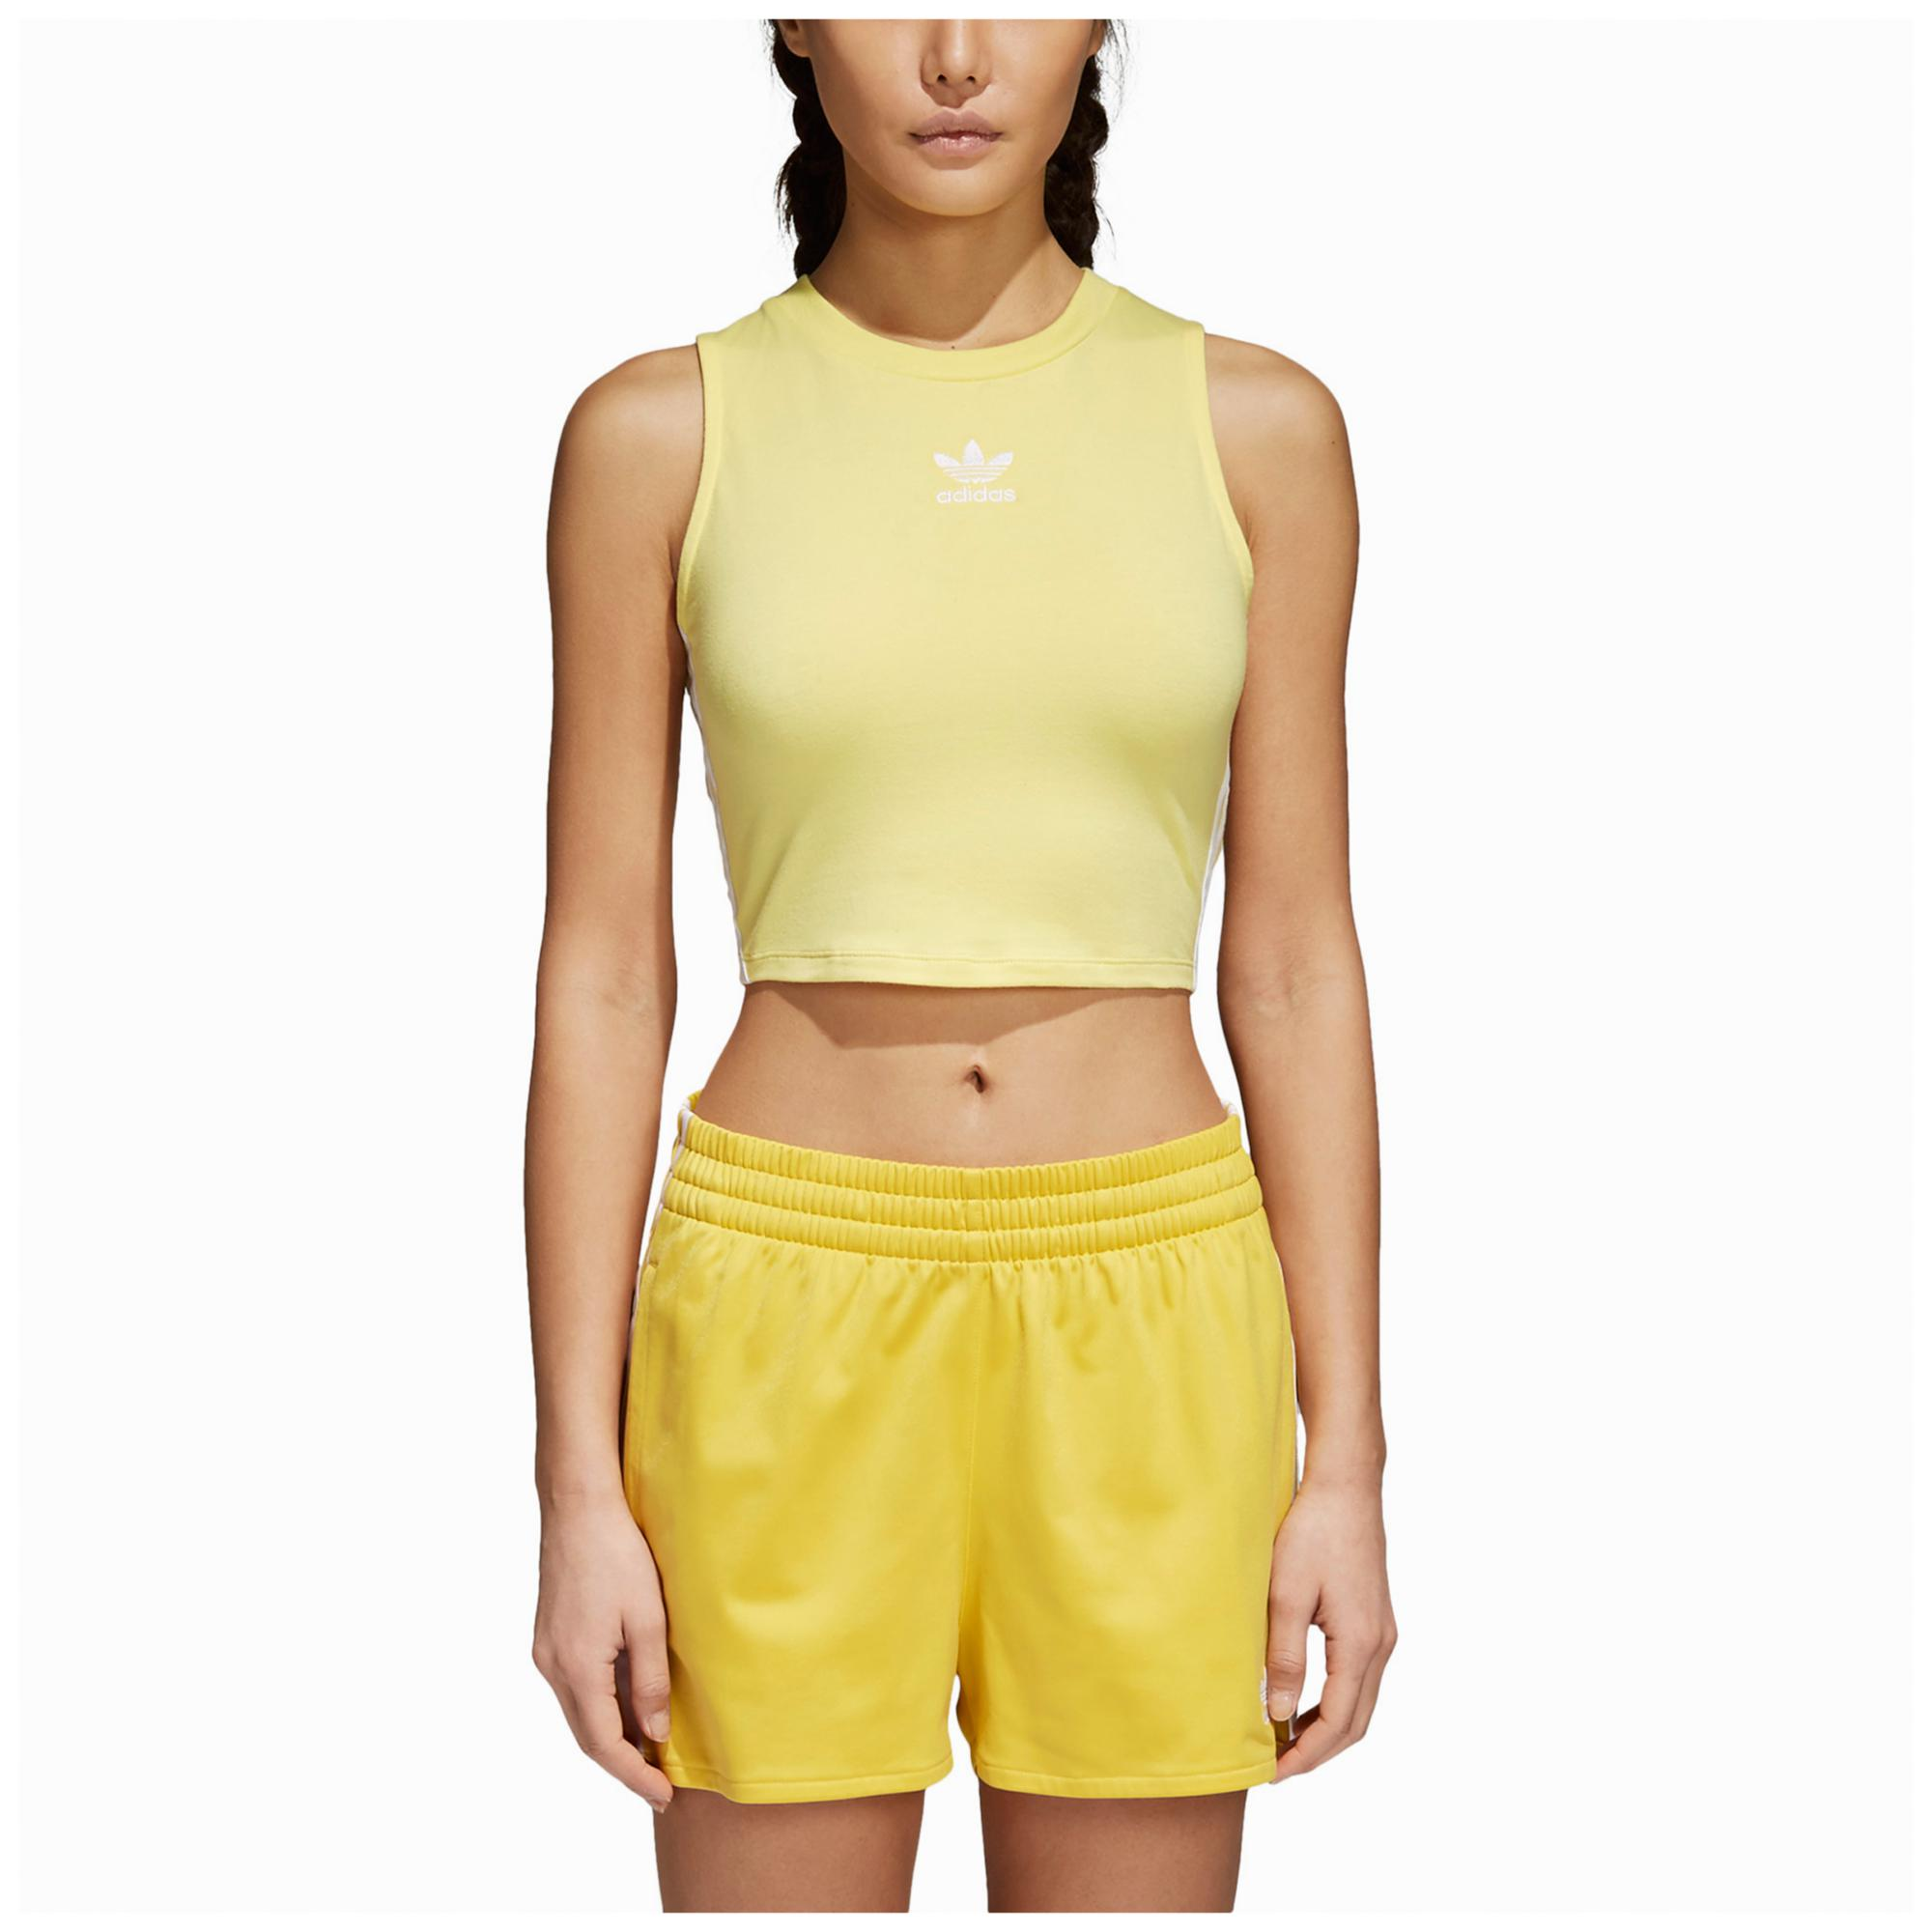 d45c13a0f56a6 Lyst - adidas Originals Adicolor Crop Tank in Yellow - Save 52%